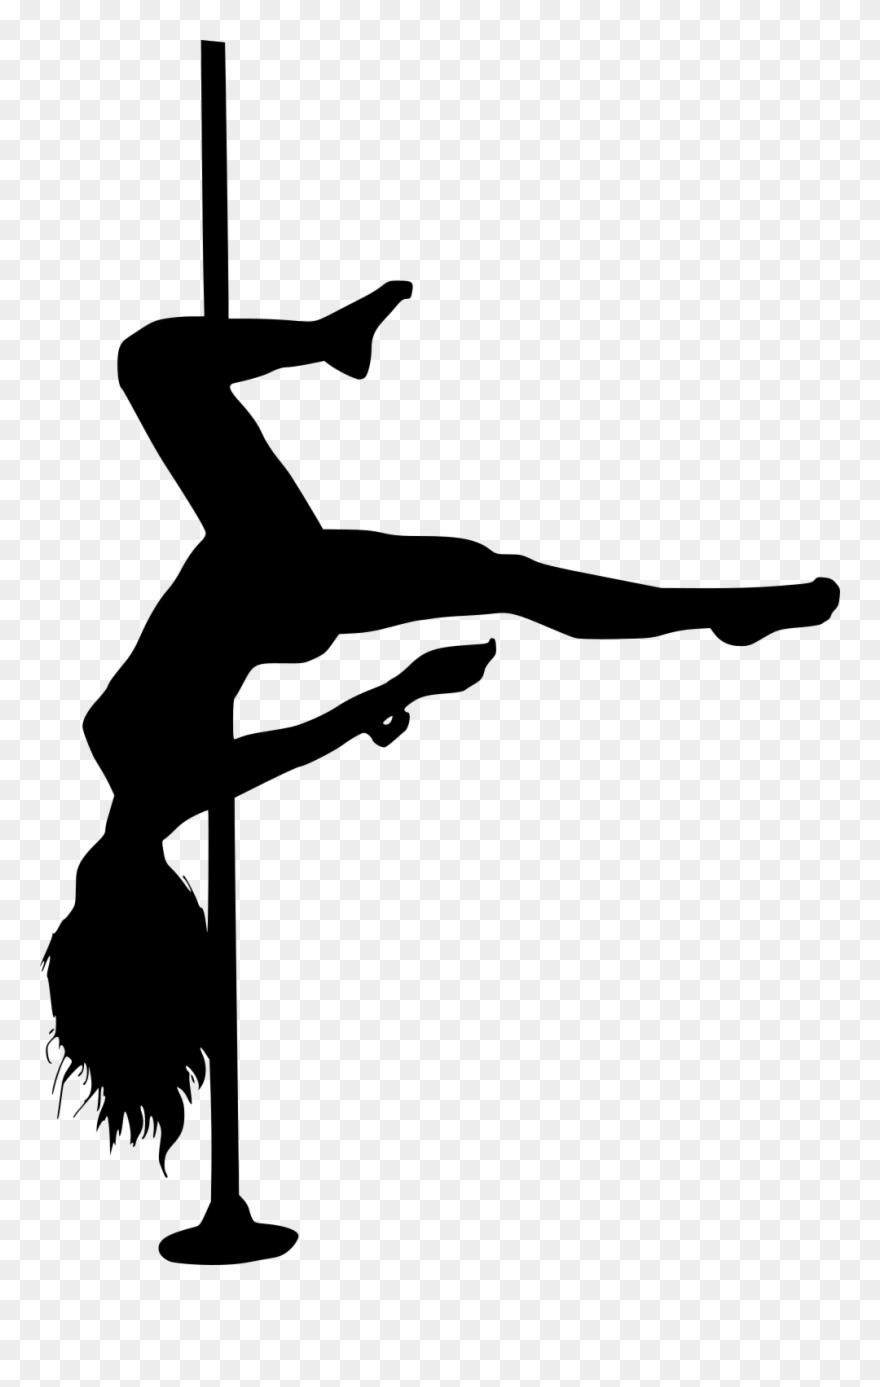 Pole Dance Png.